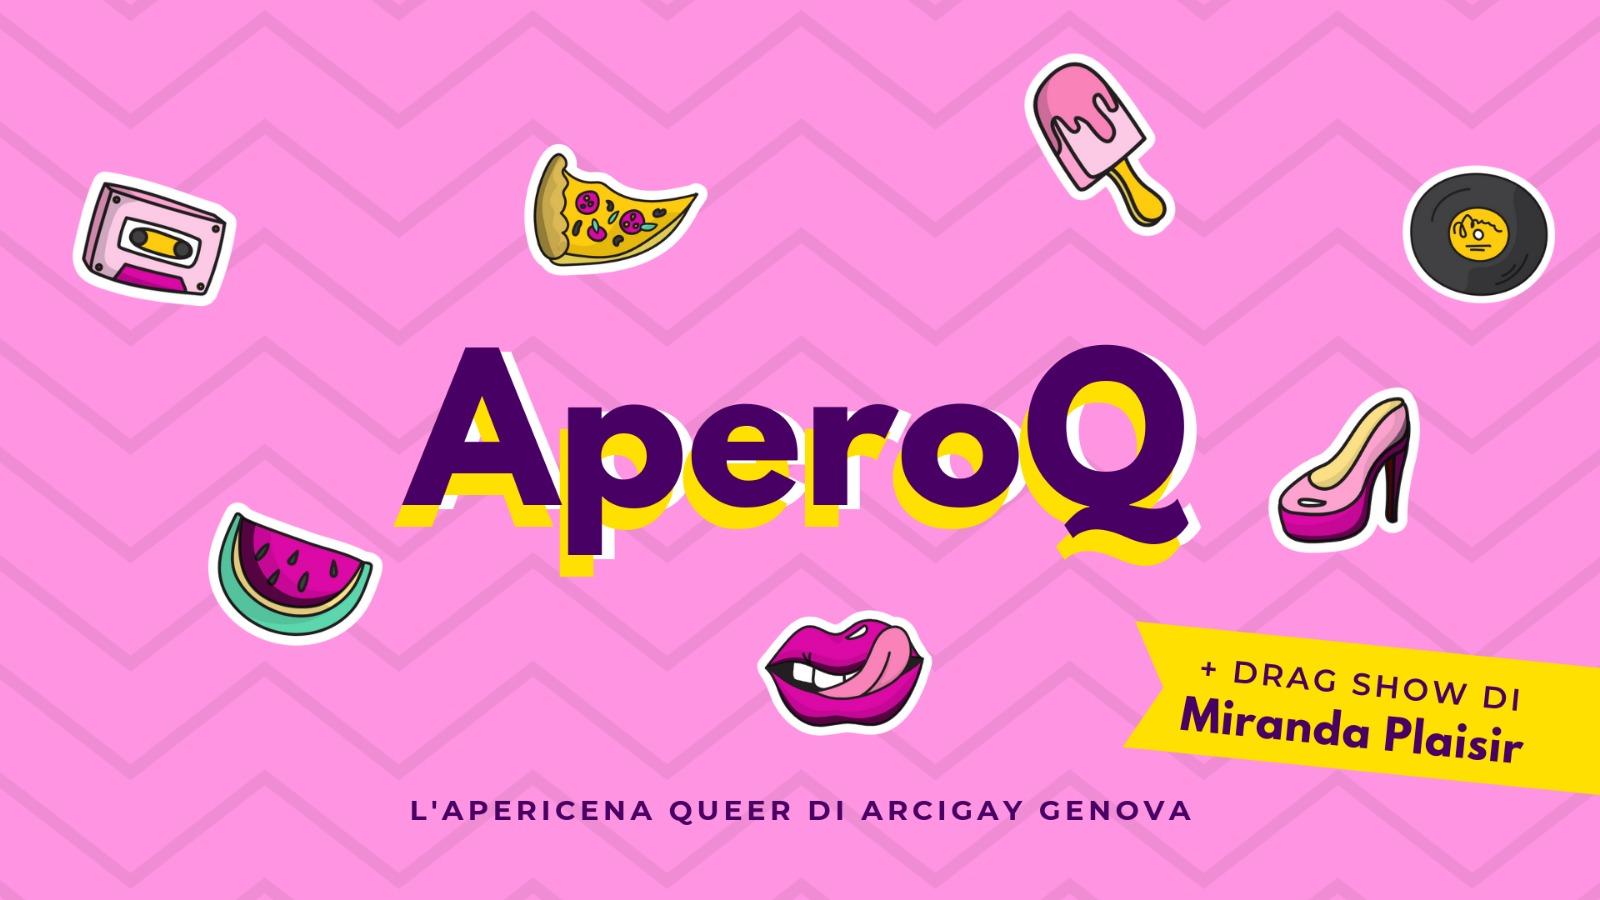 Apericena Queer